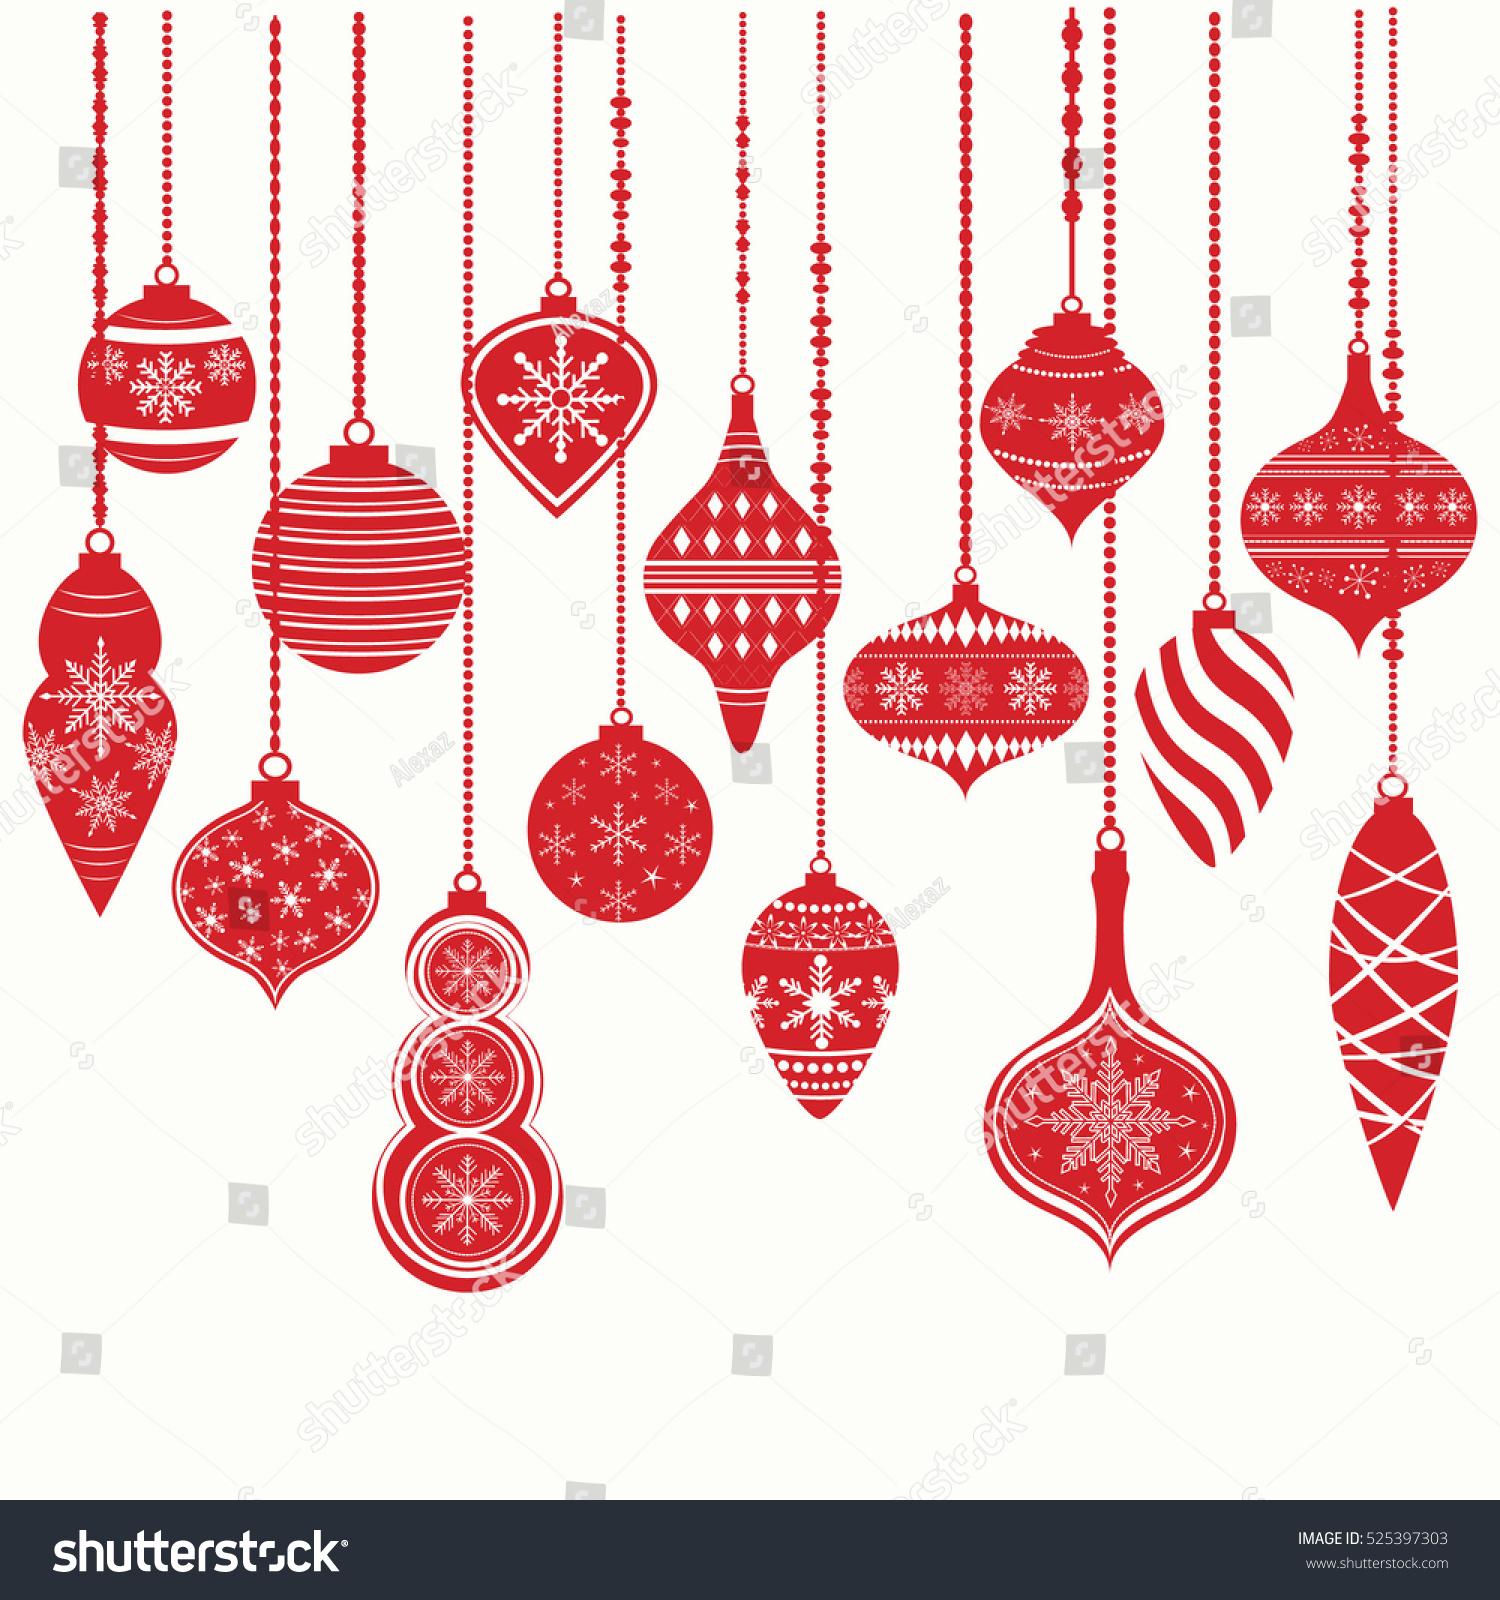 Christmas ornamentschristmas balls decorations